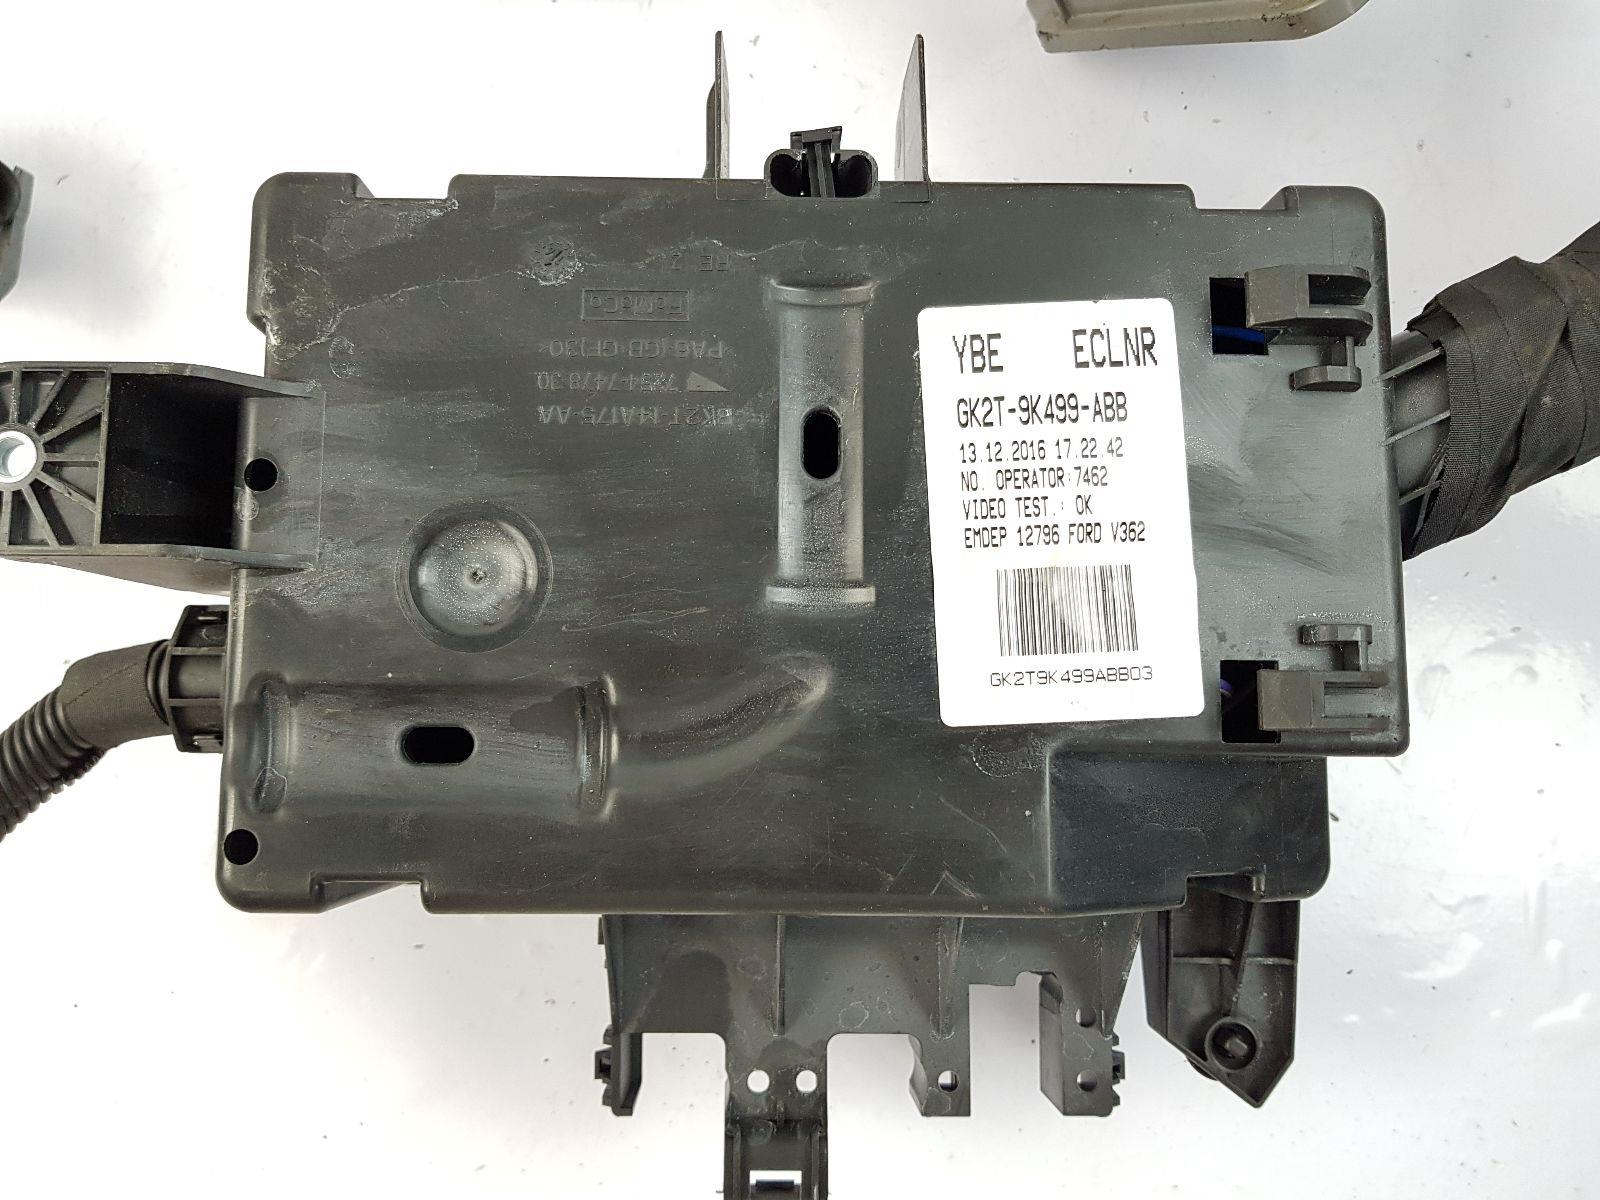 hight resolution of  2012 on mk8 ford transit custom engine bay fuse box gk2t9k499abb